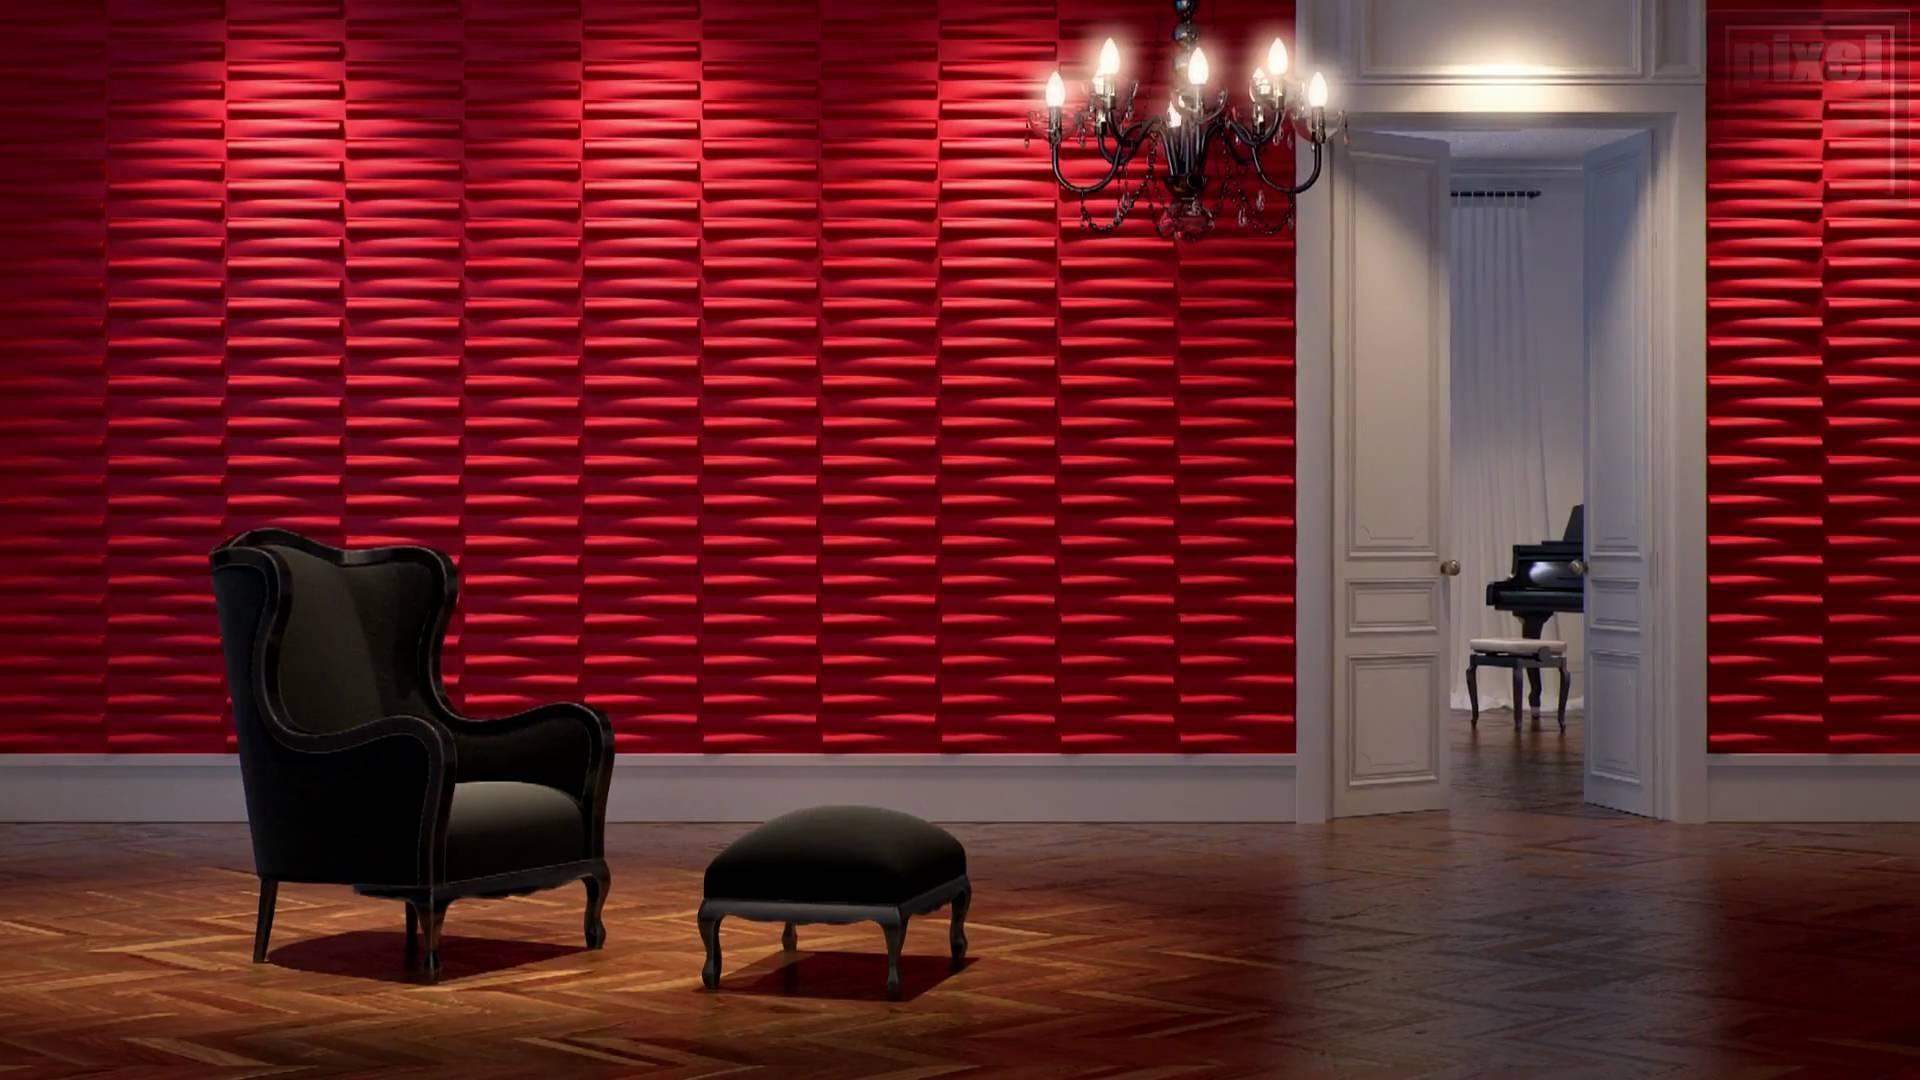 2018 latest vidella 3d wall art. Black Bedroom Furniture Sets. Home Design Ideas